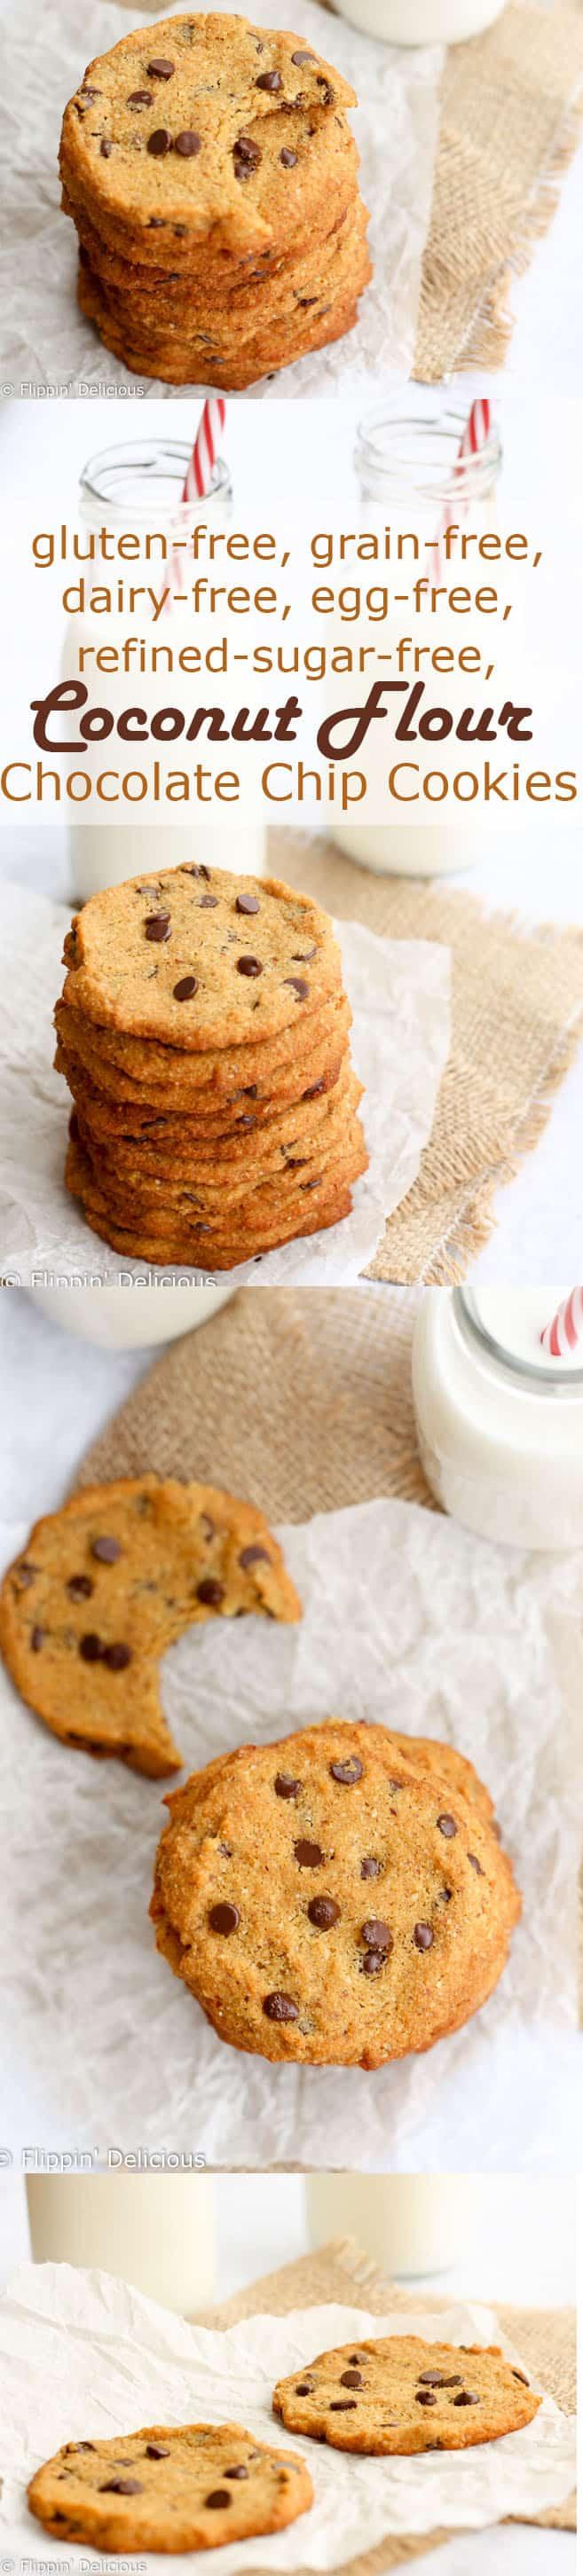 Gluten Free Dairy Free Sugar Free Cookies  gluten free sugar free coconut cookies